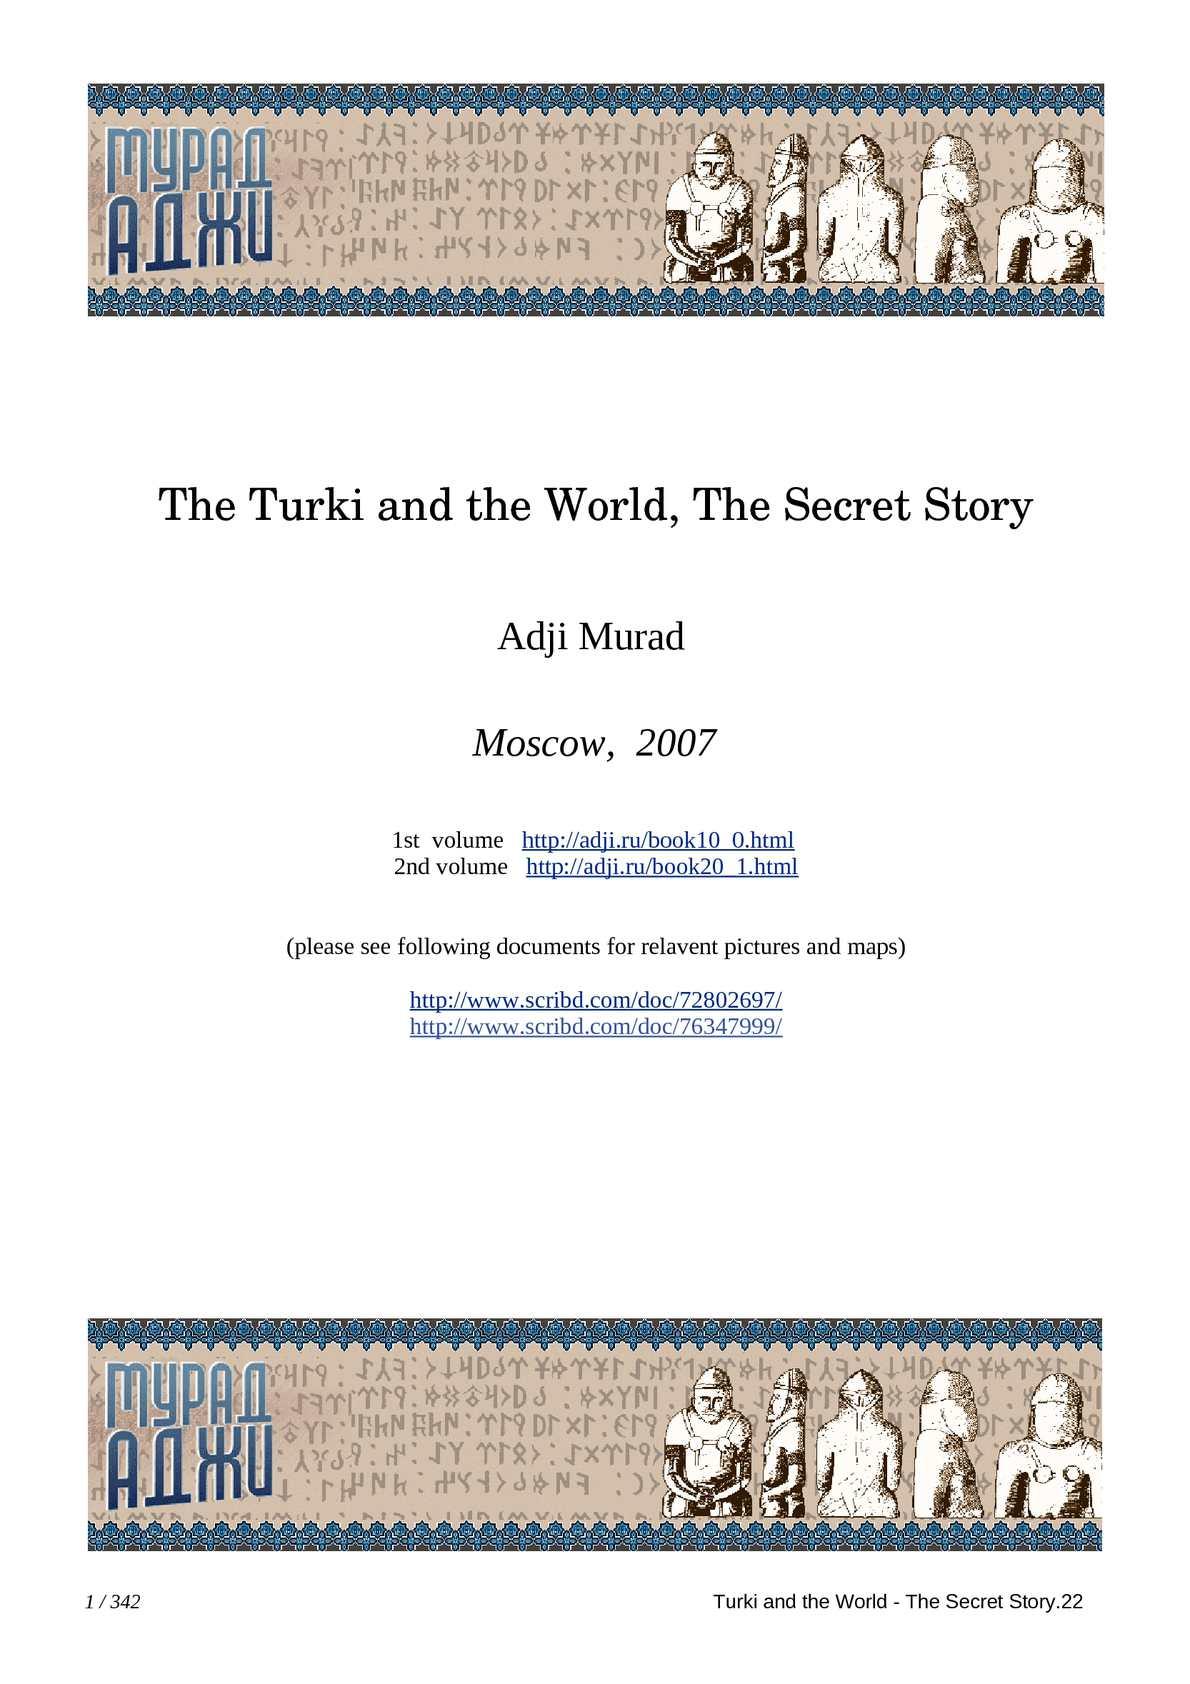 Calaméo - Avrasya - Turks and the World, Secret Story v2-M Adji